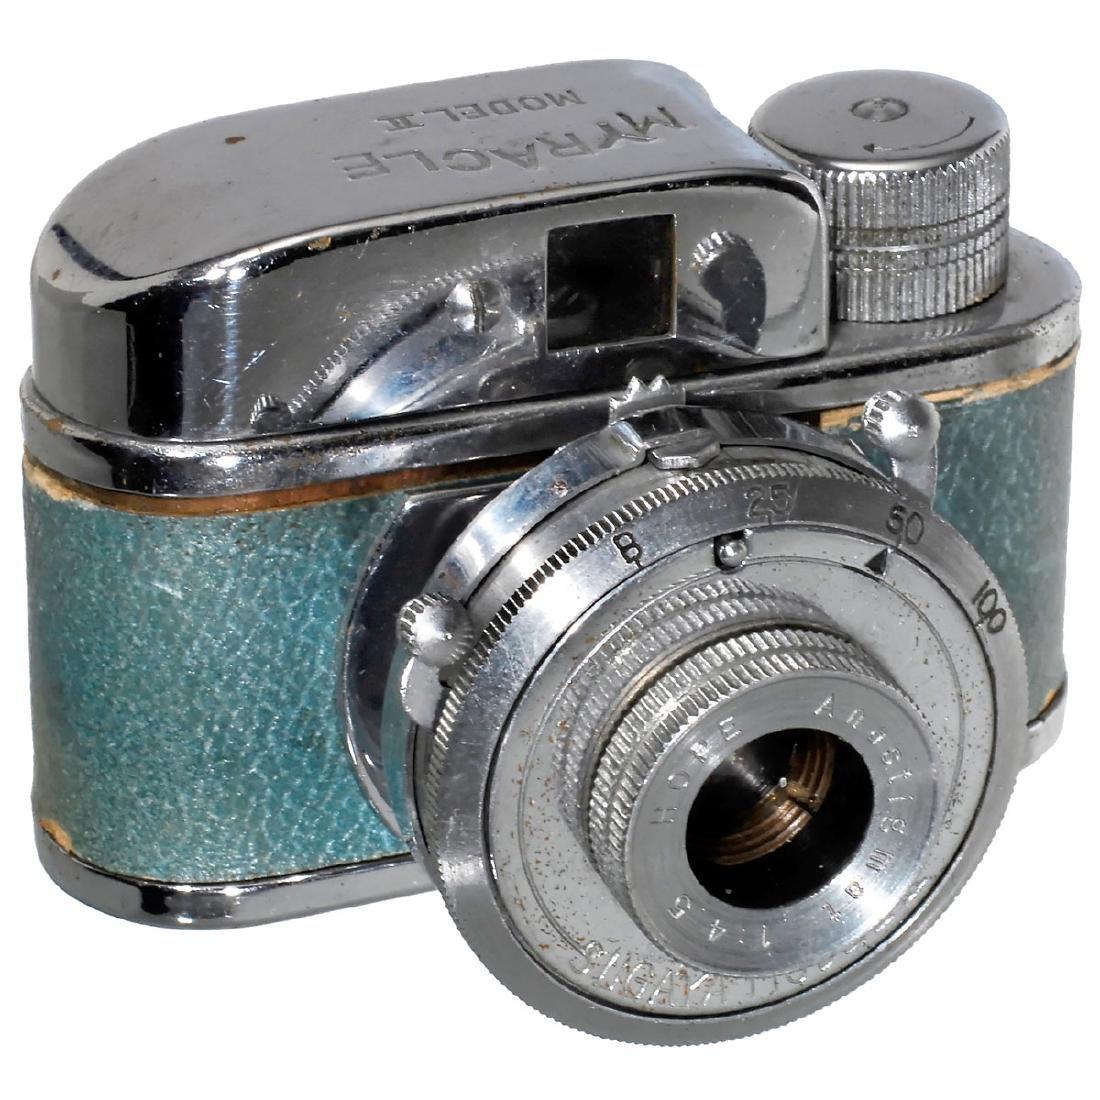 Myracle Model II (Blue), c. 1950